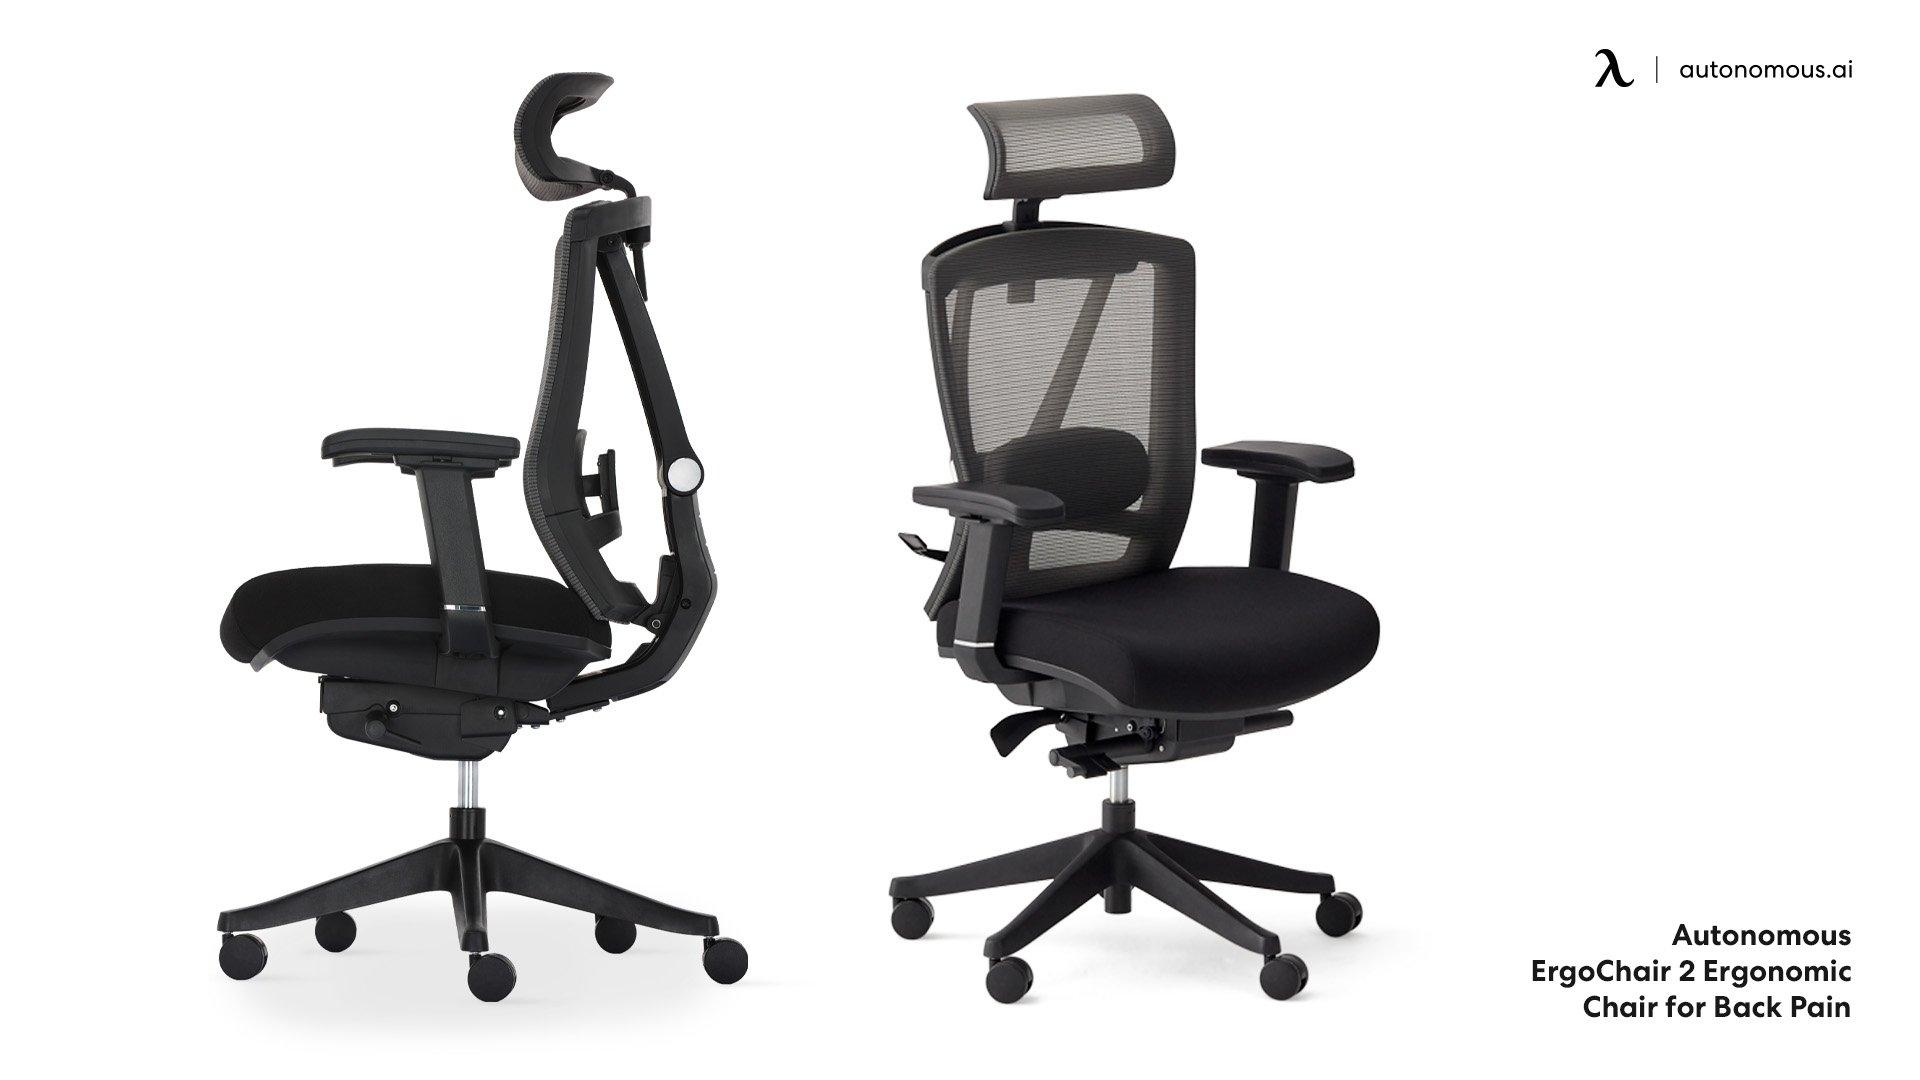 Ergonomic chair for back pain